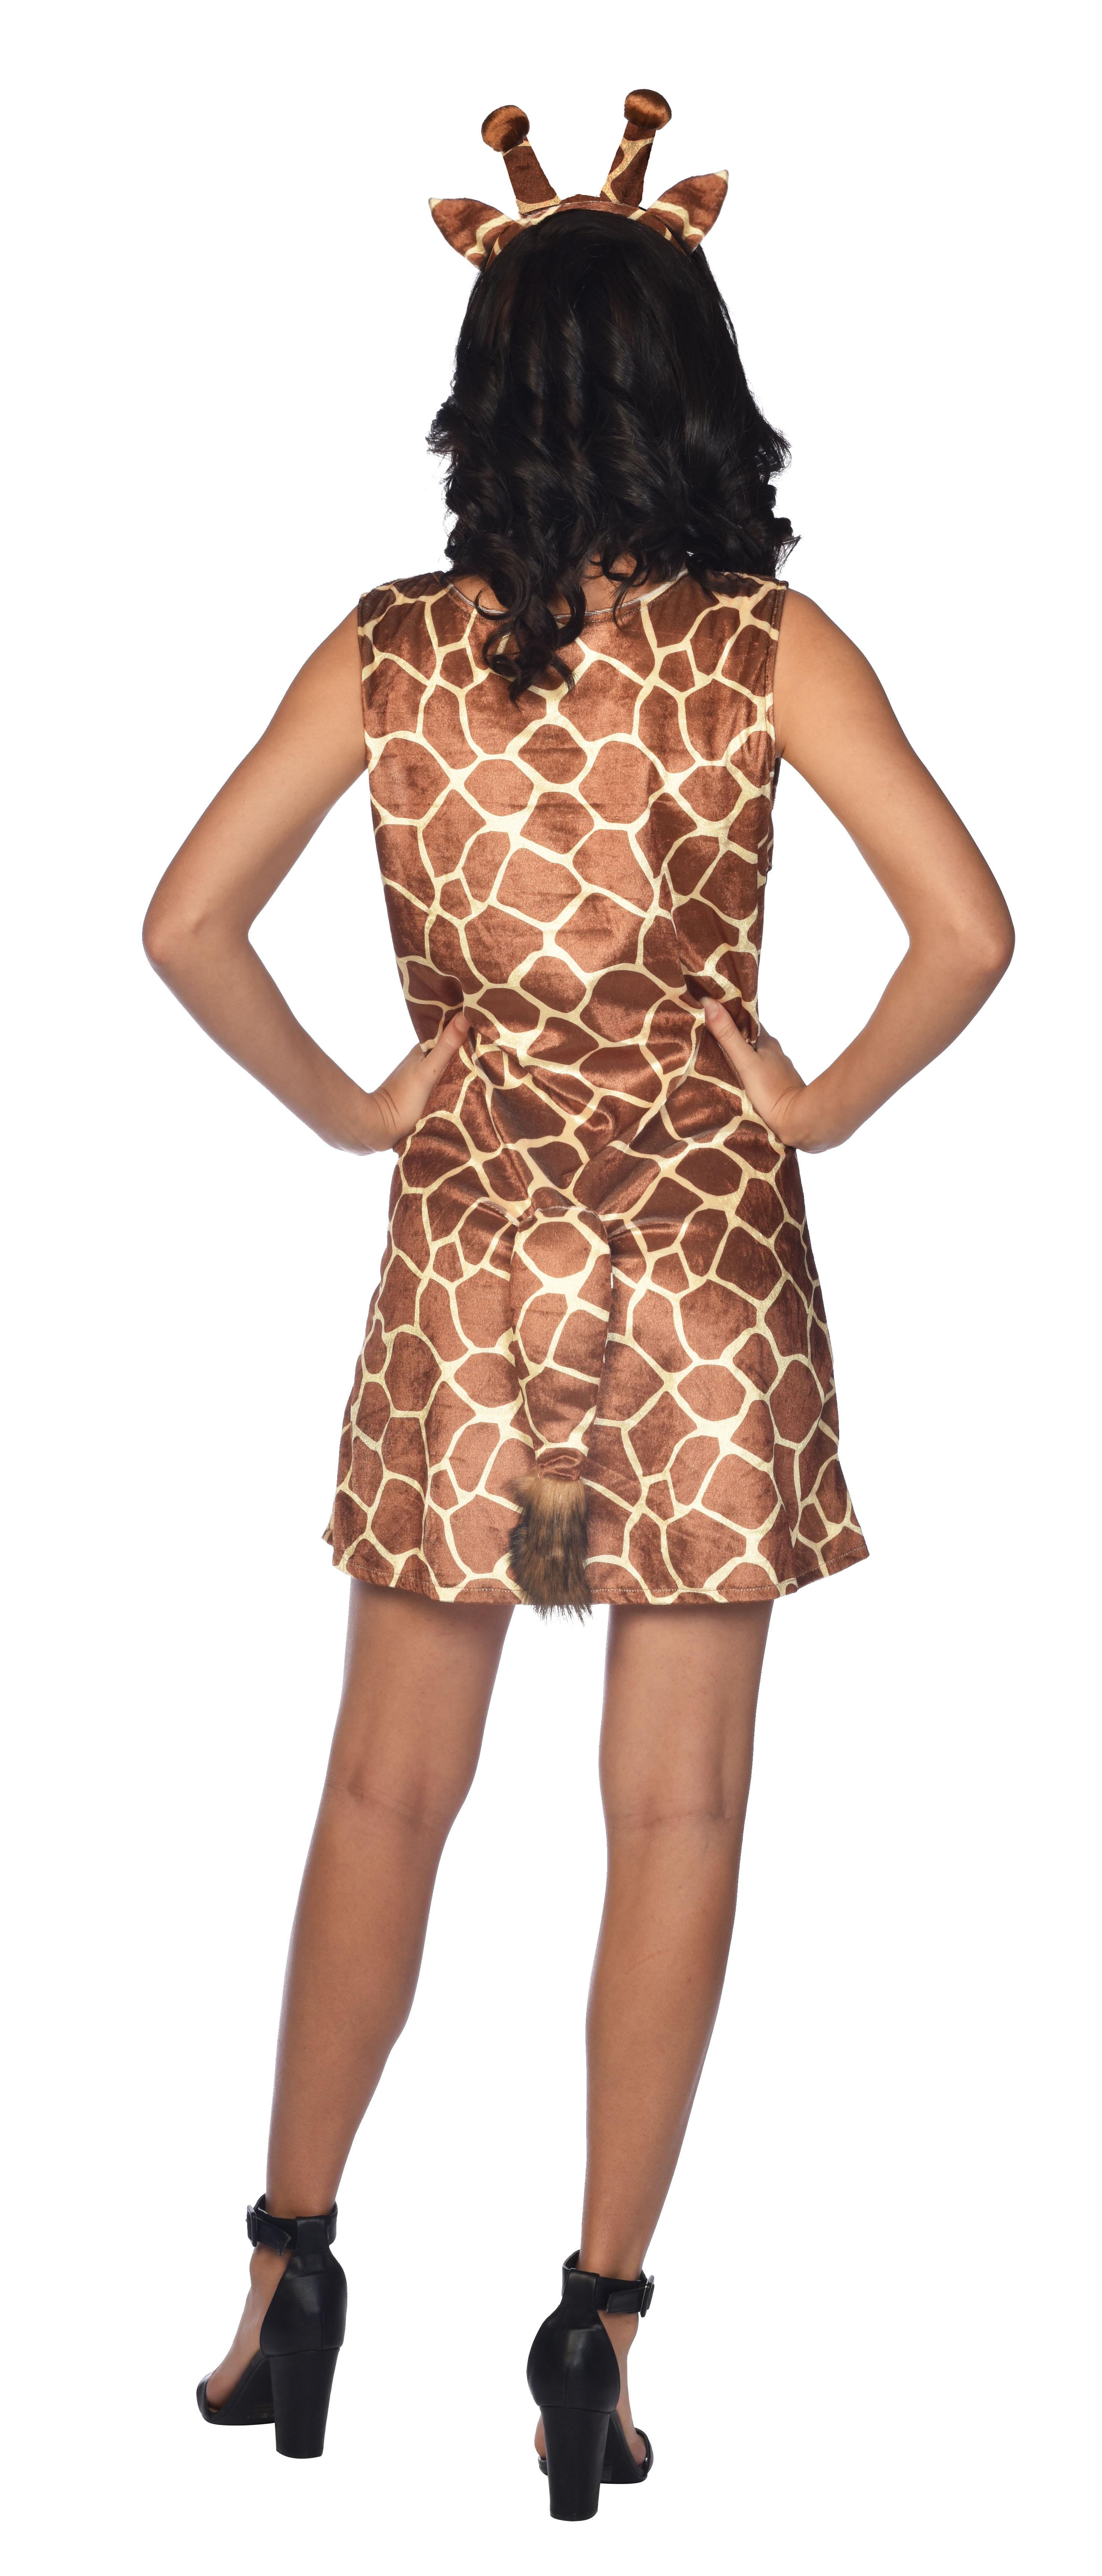 Indexbild 24 - Adult Ladies Zoo Safari Animal Giraffe Lady Fancy Dress Costume Womens Outfit